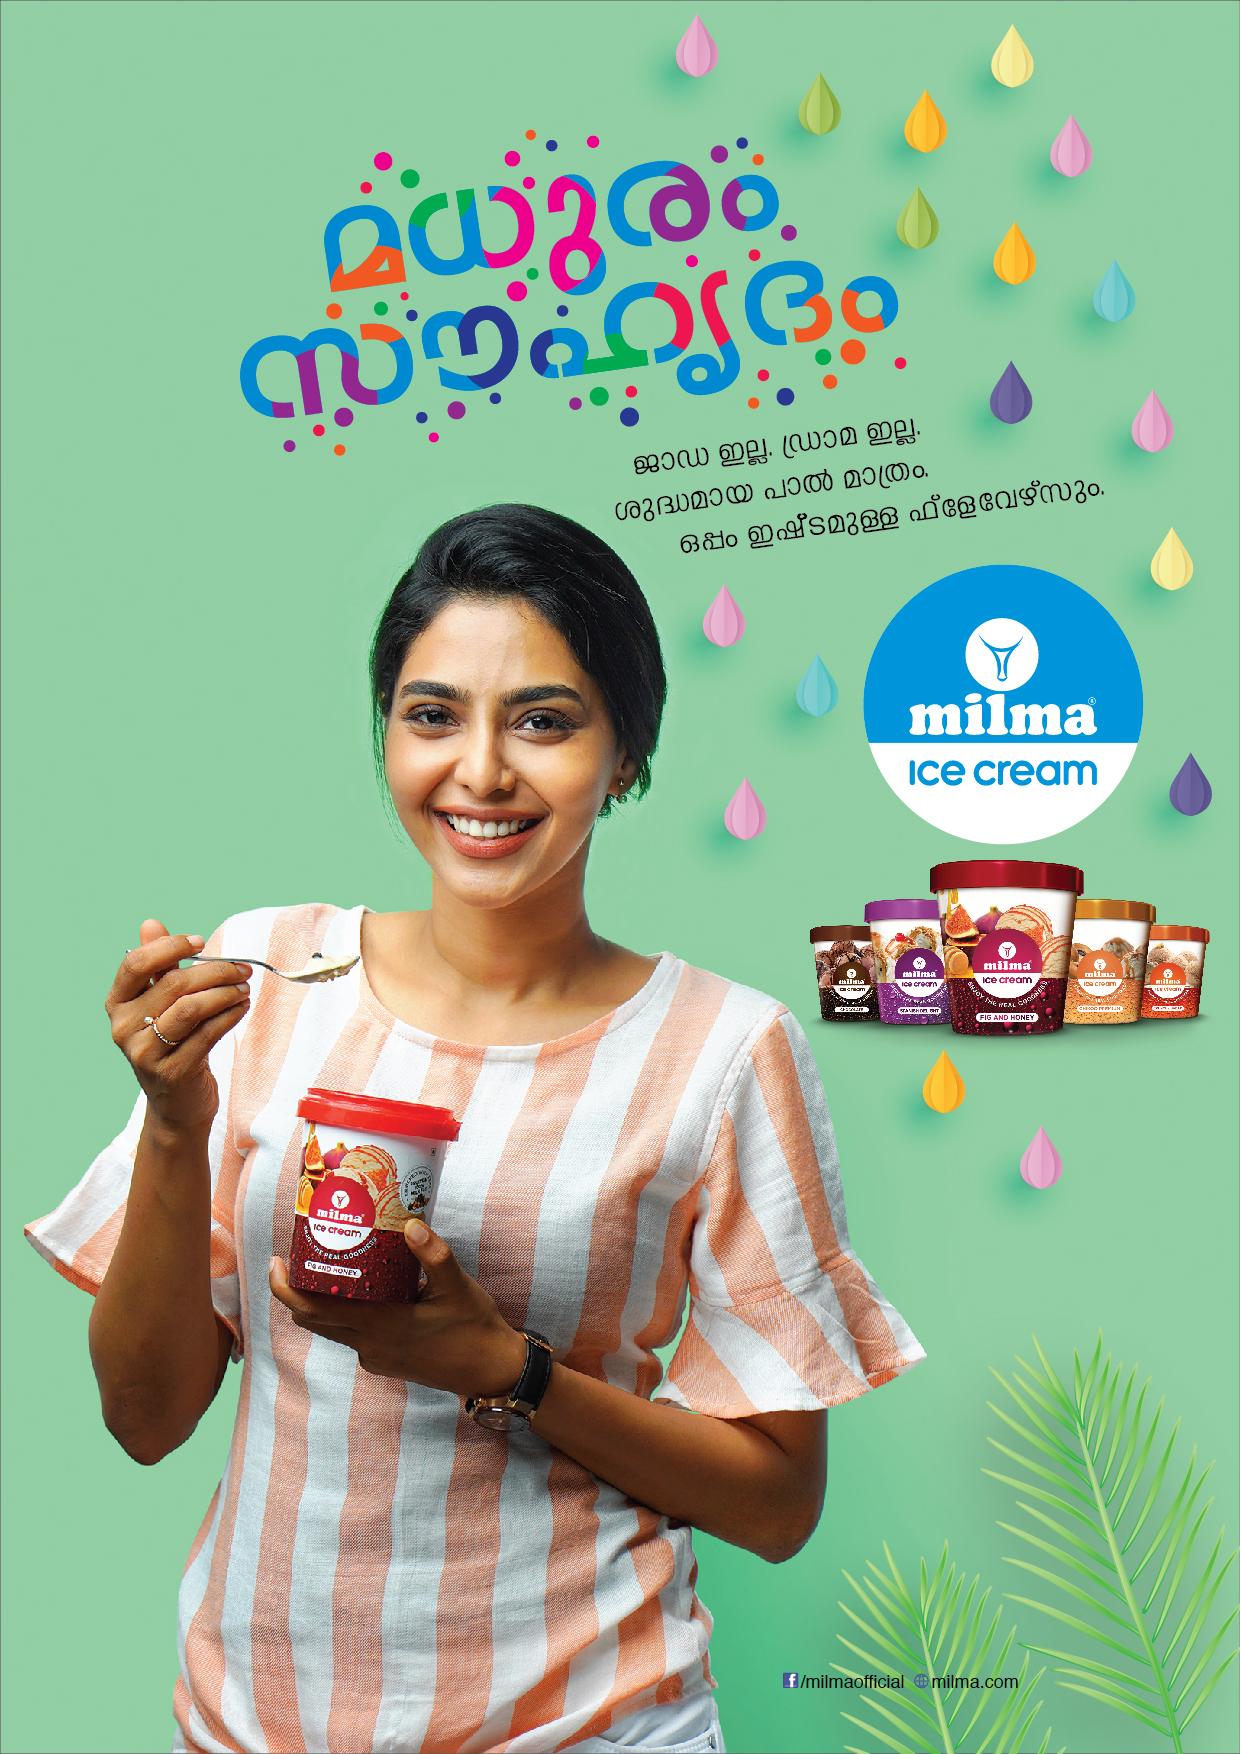 Milma Icecream Advertisement by Malayalam Actress Aishwarya Lekshmi | Print mock-up 4 by Stark Communications Pvt Ltd